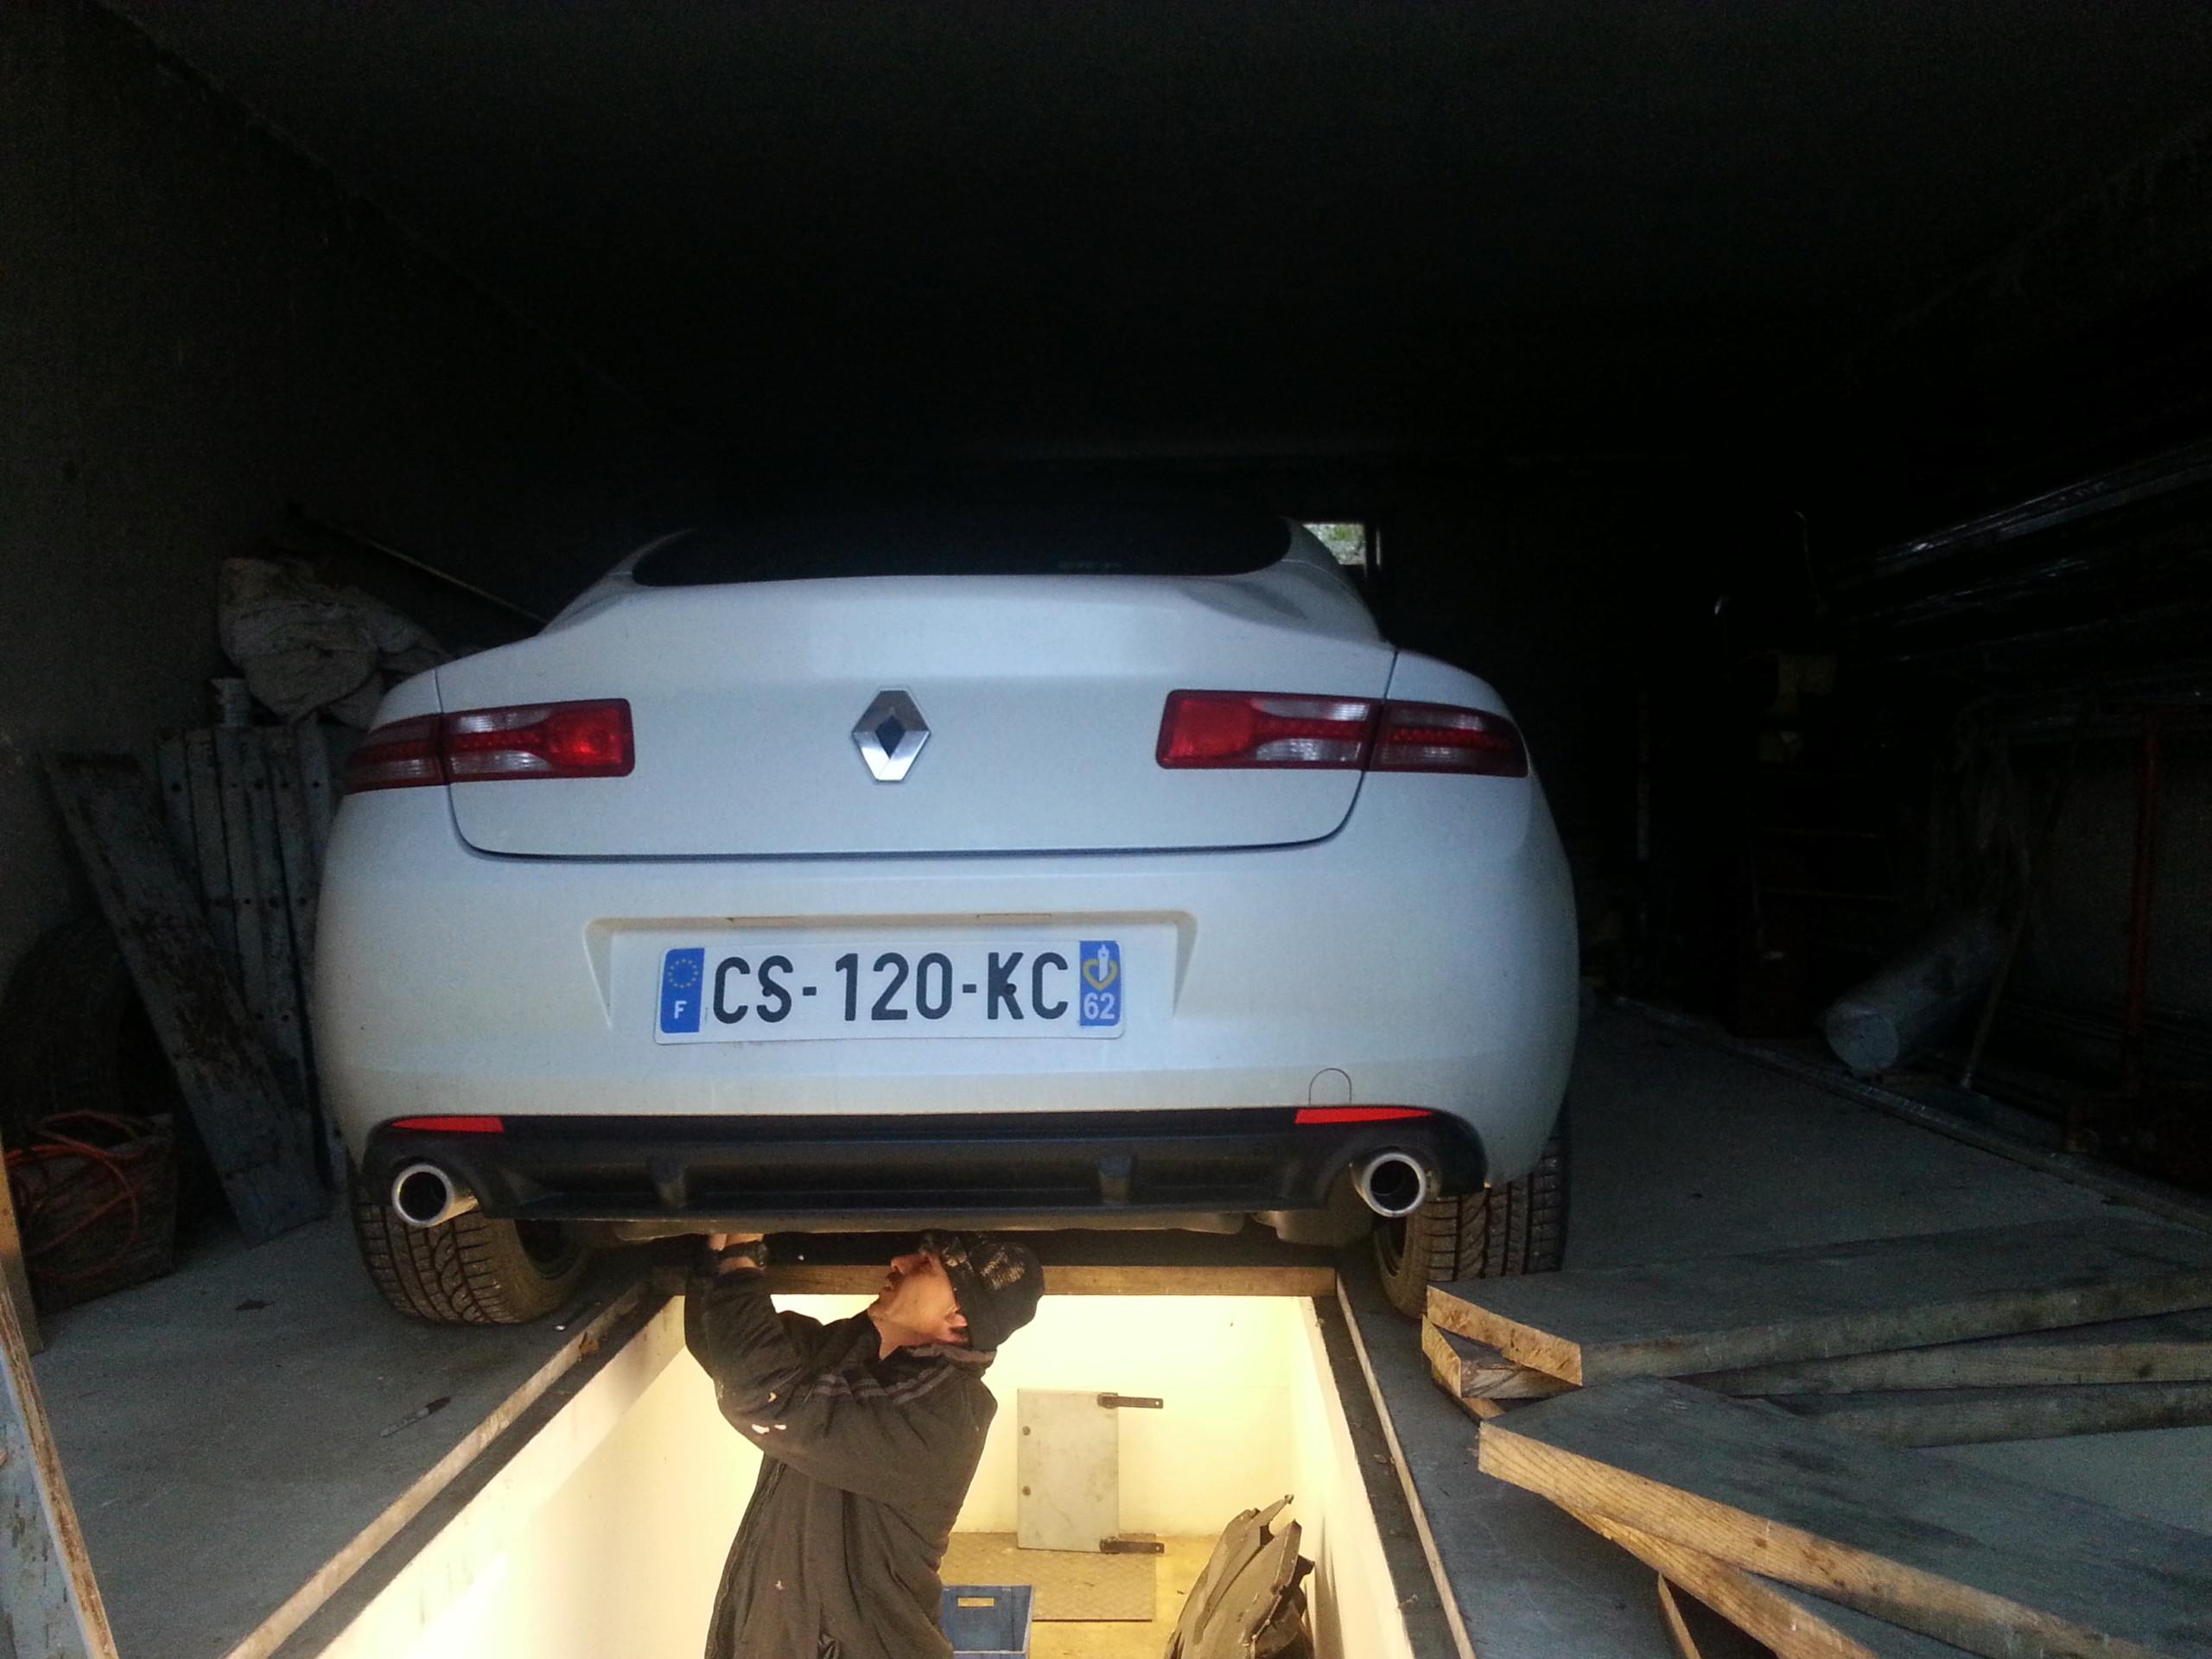 [Cédric68] Laguna III coupé GT 4Control 2,0 dCi 180  - Page 10 20131213